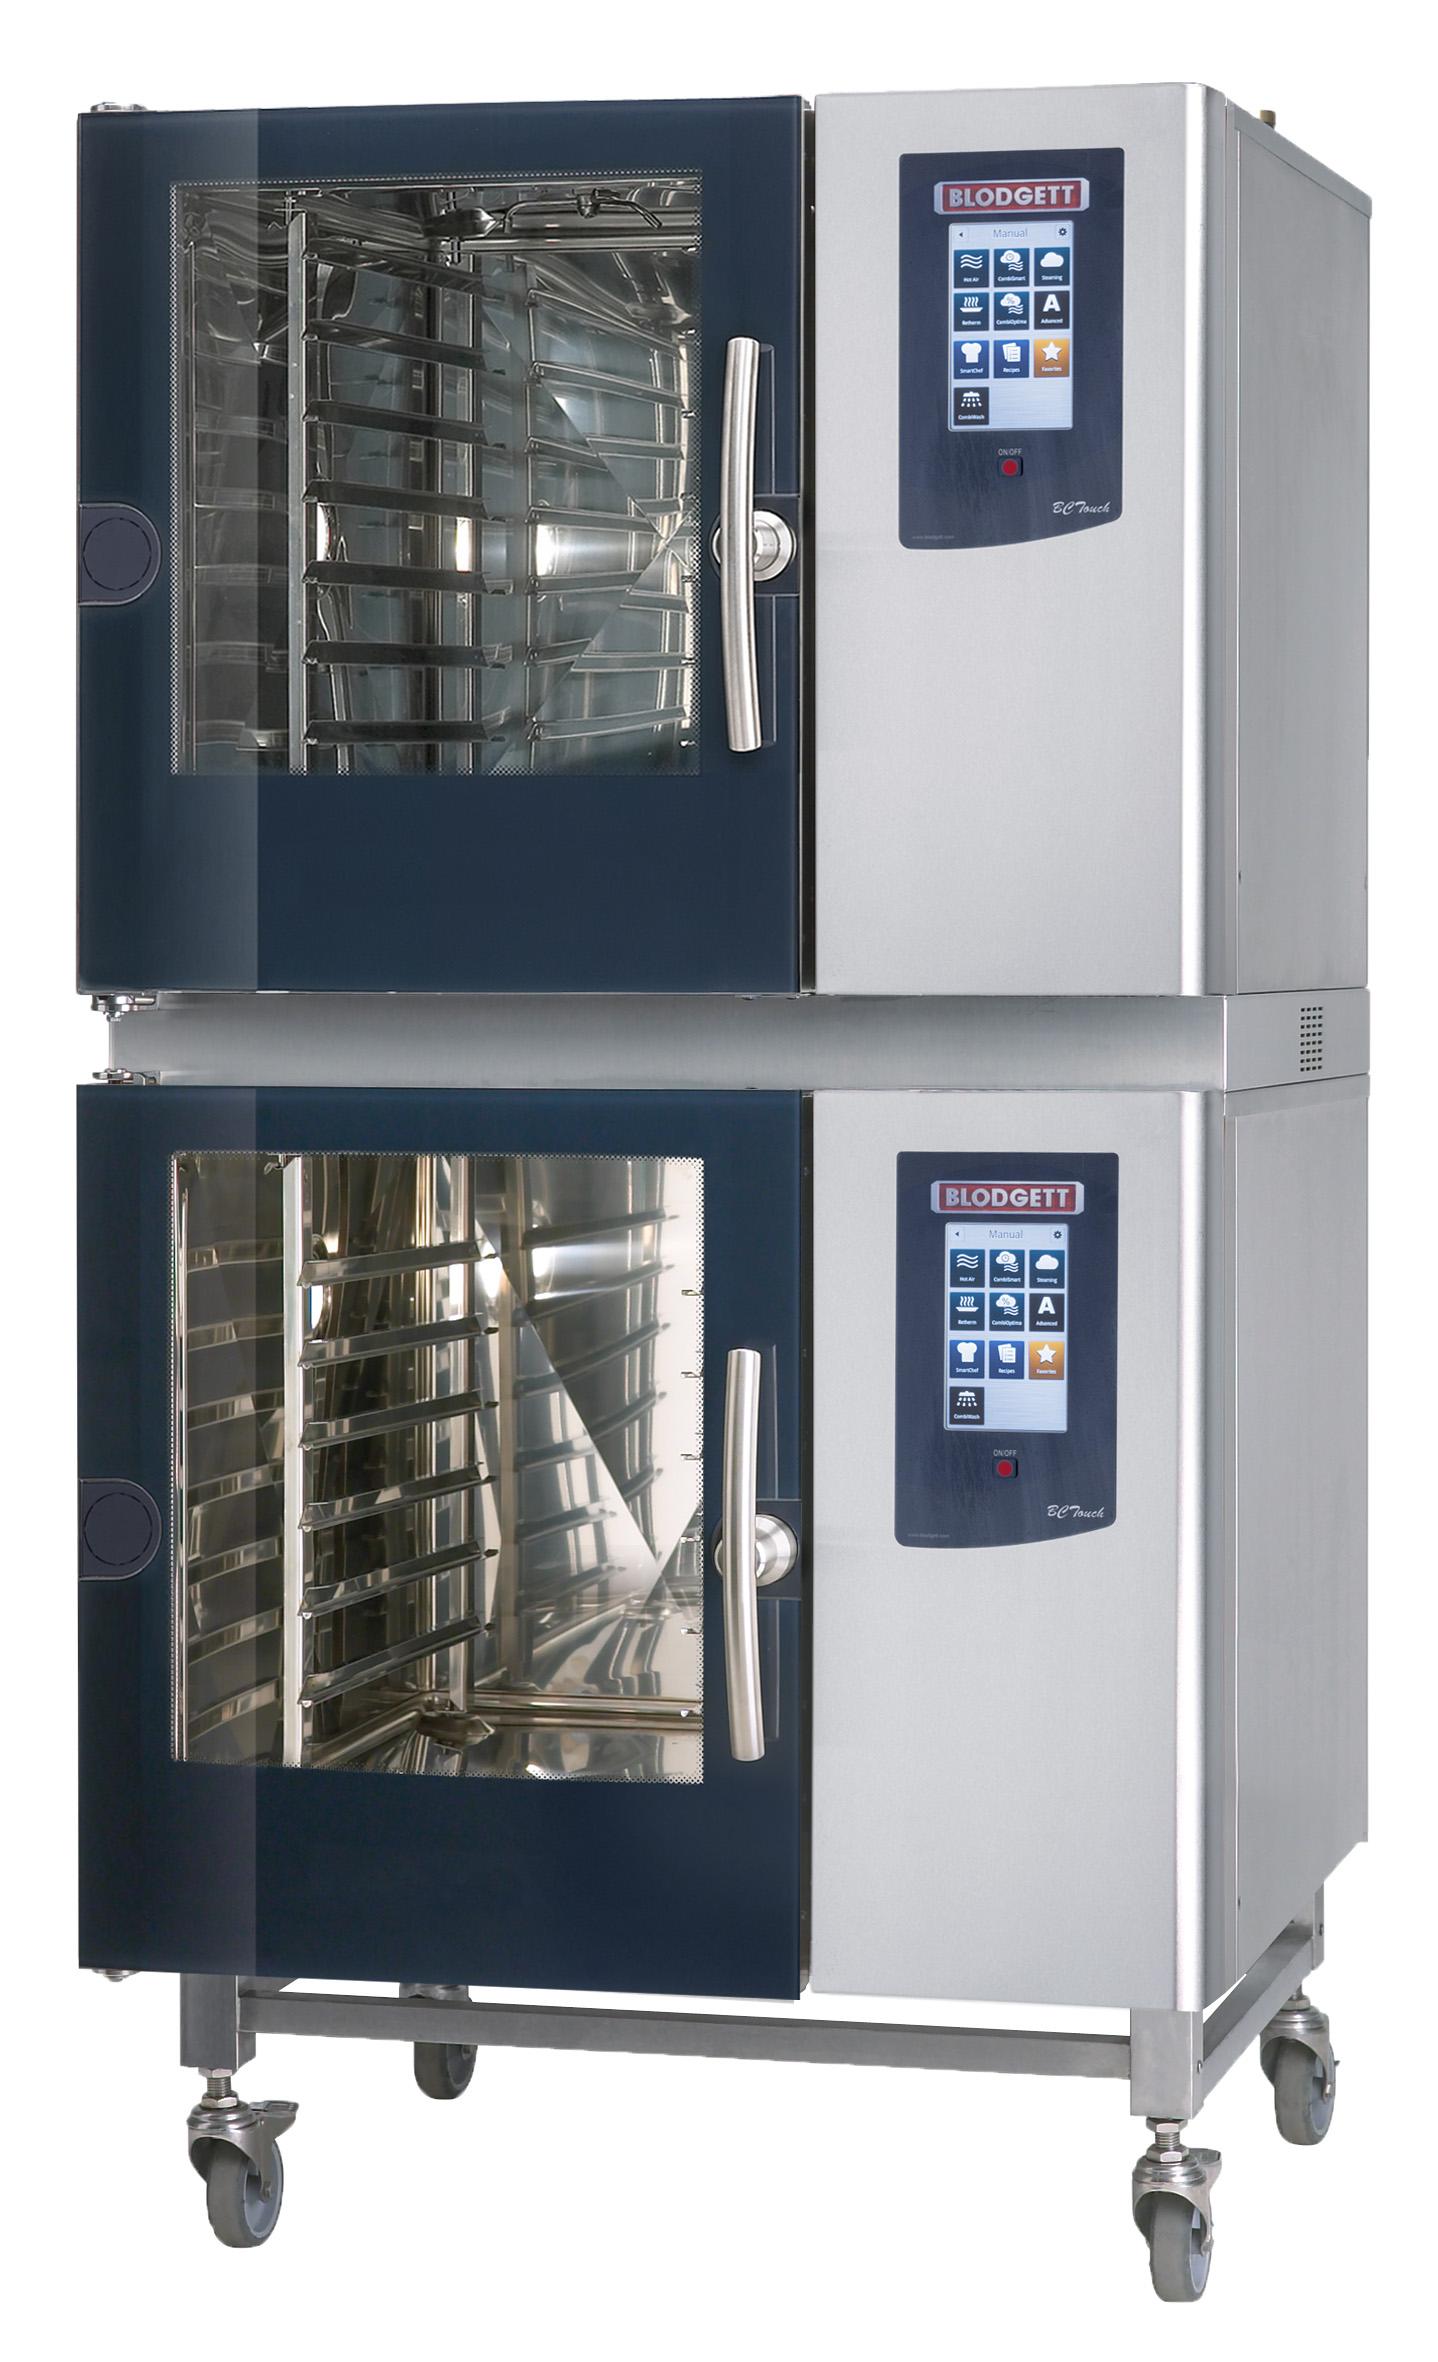 Blodgett BLCT61E/BLCT61E combi oven